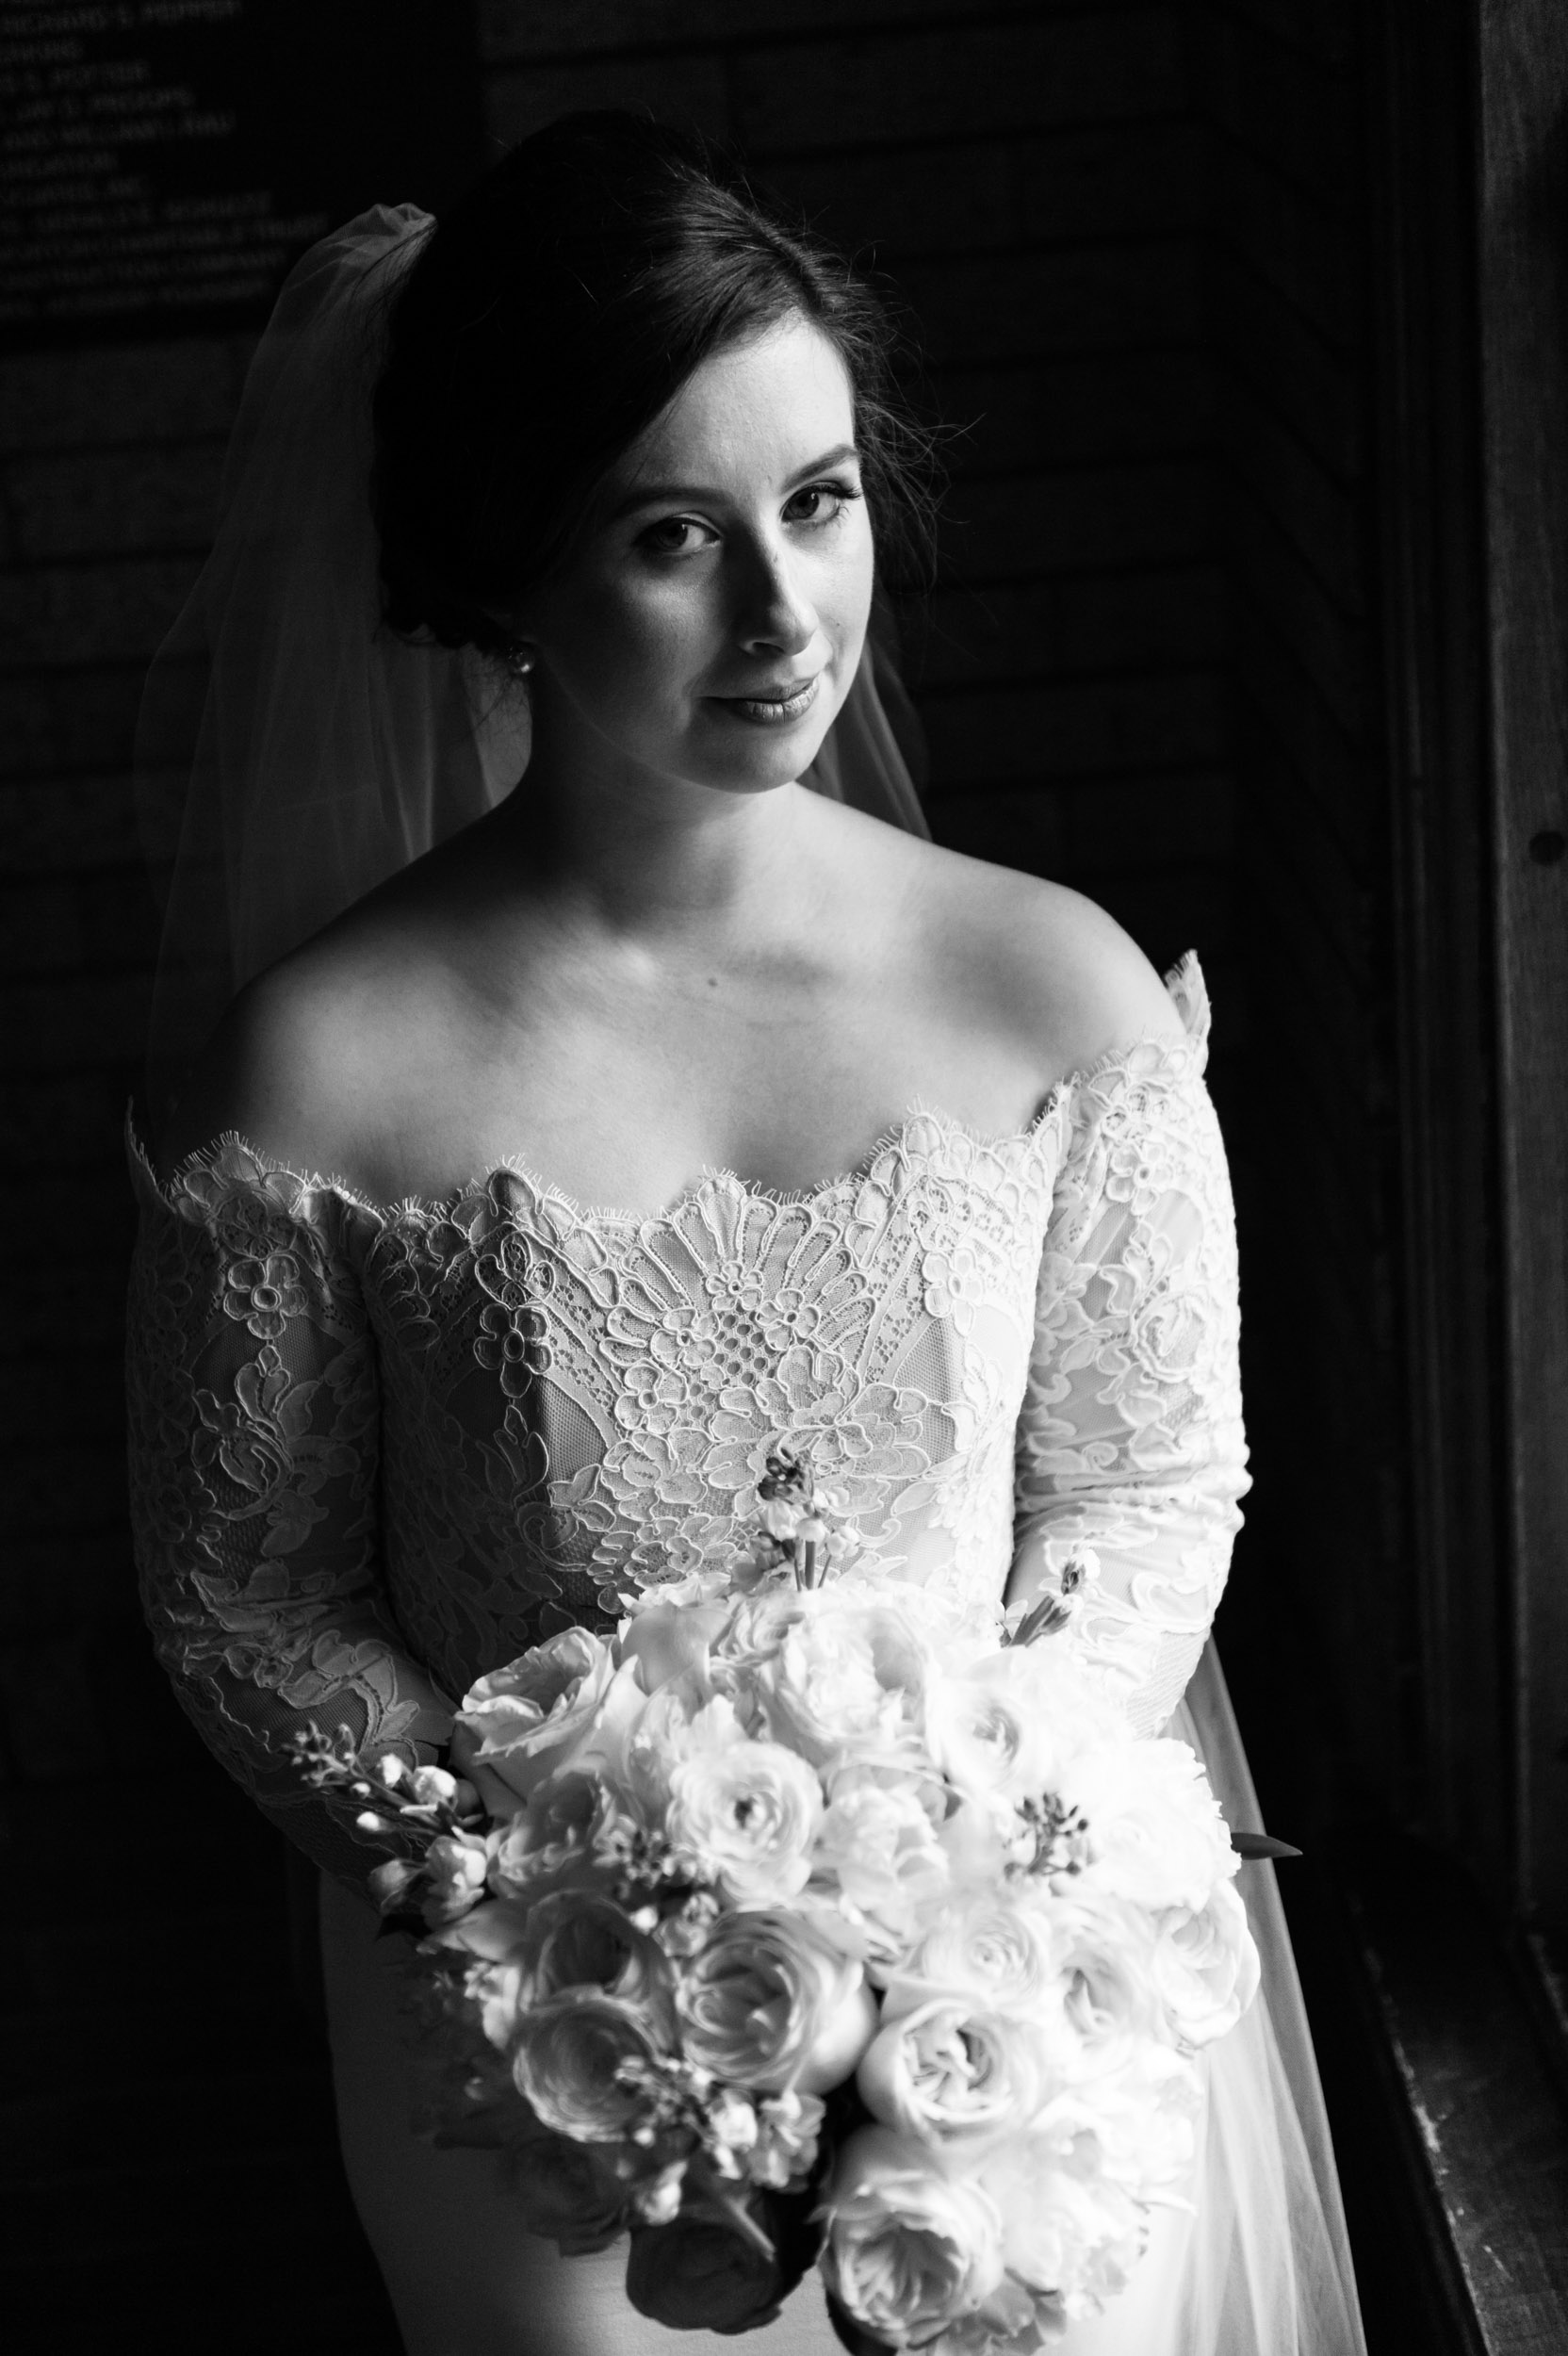 Moody bridal wedding photography Chicago